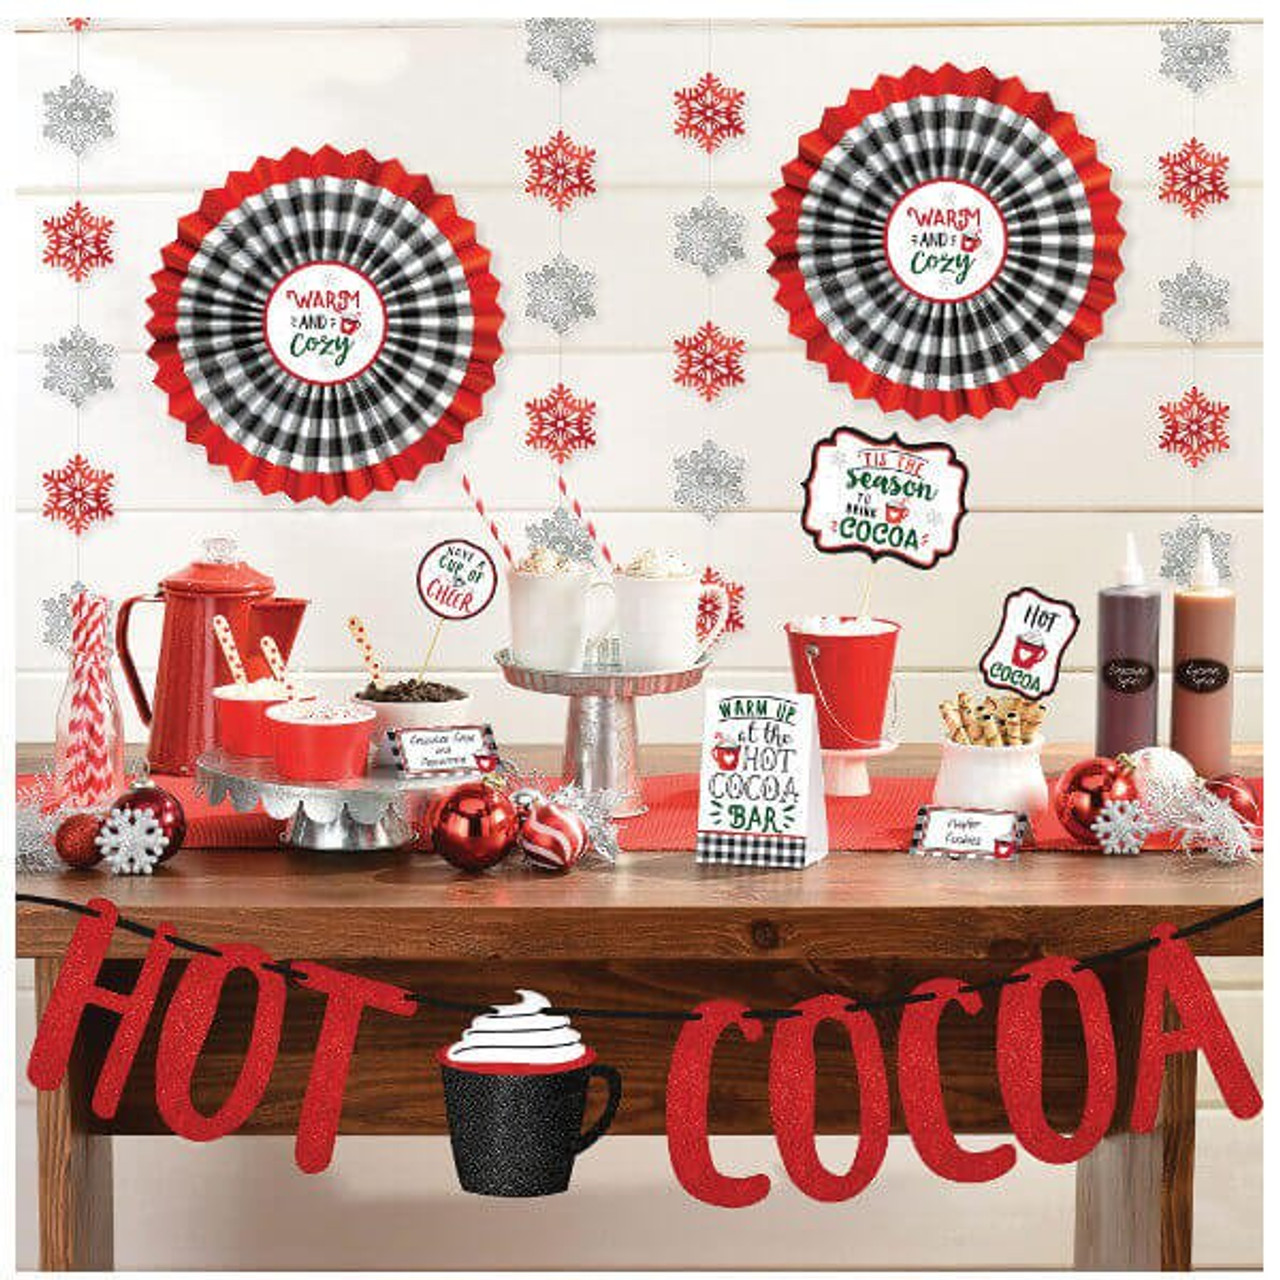 Hot Cocoa 23 pc. Decor Kit